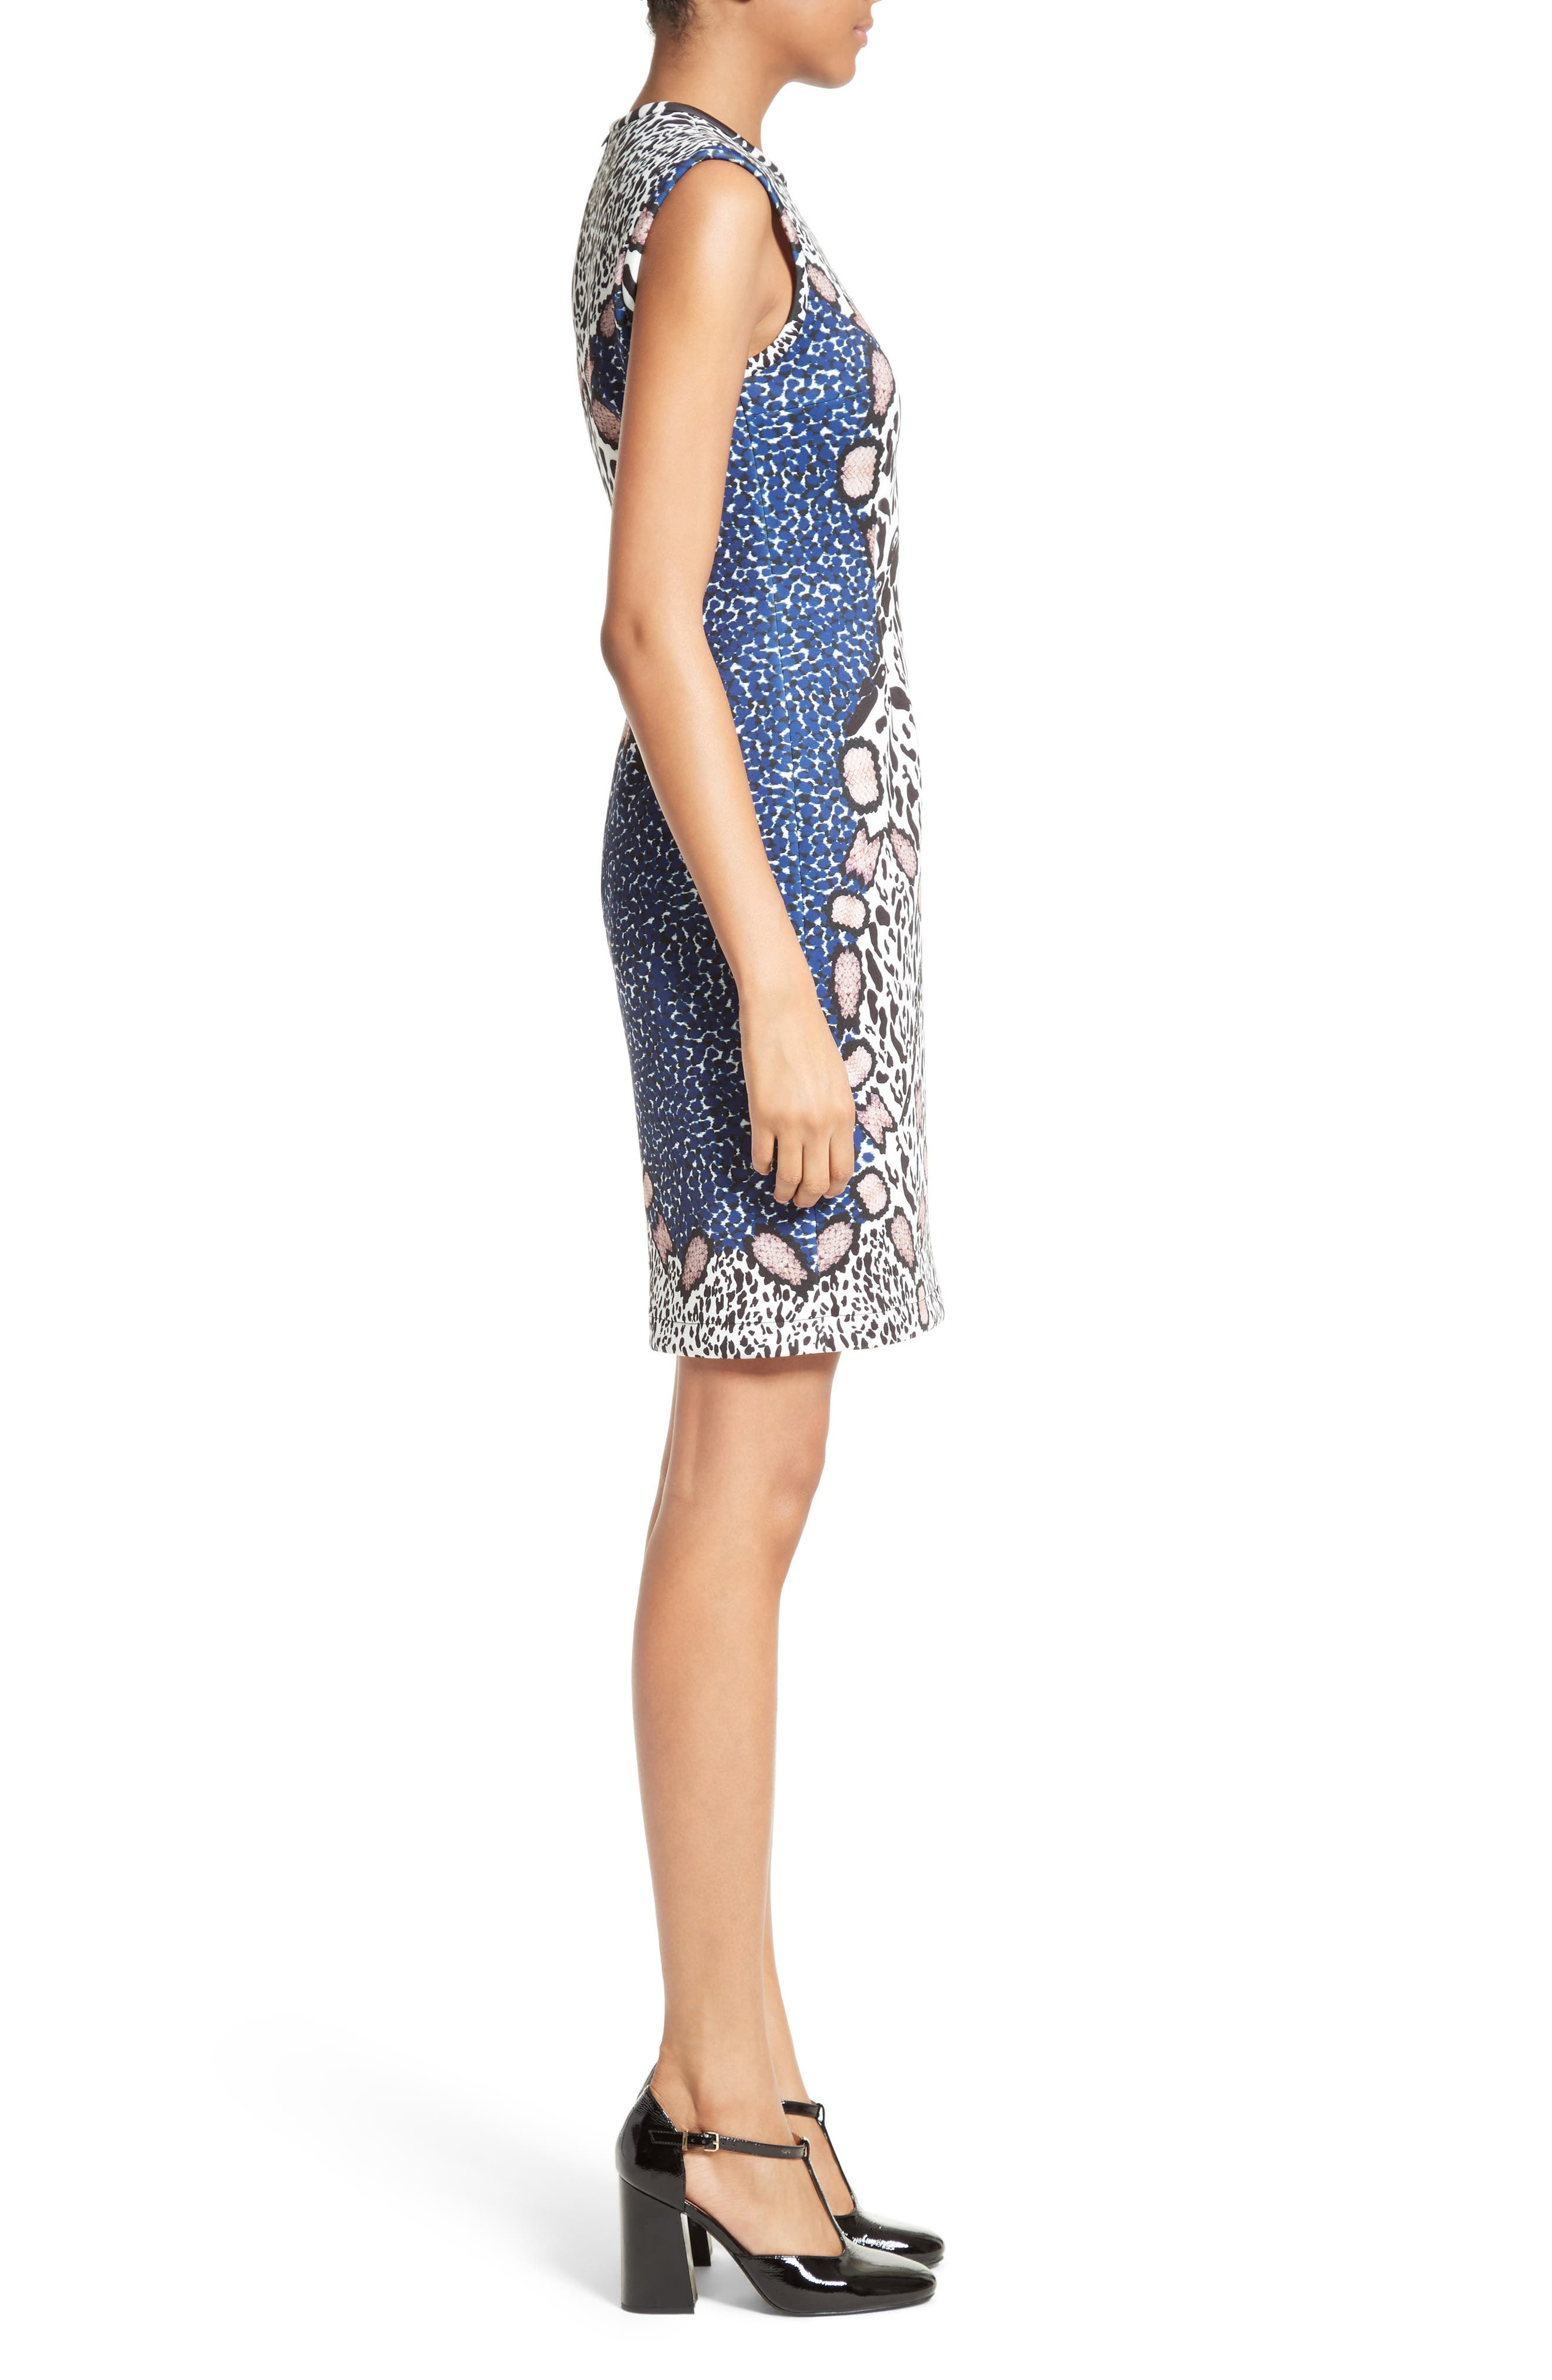 Cheetah Neoprene Sheath Dress,                             Alternate thumbnail 3, color,                             002